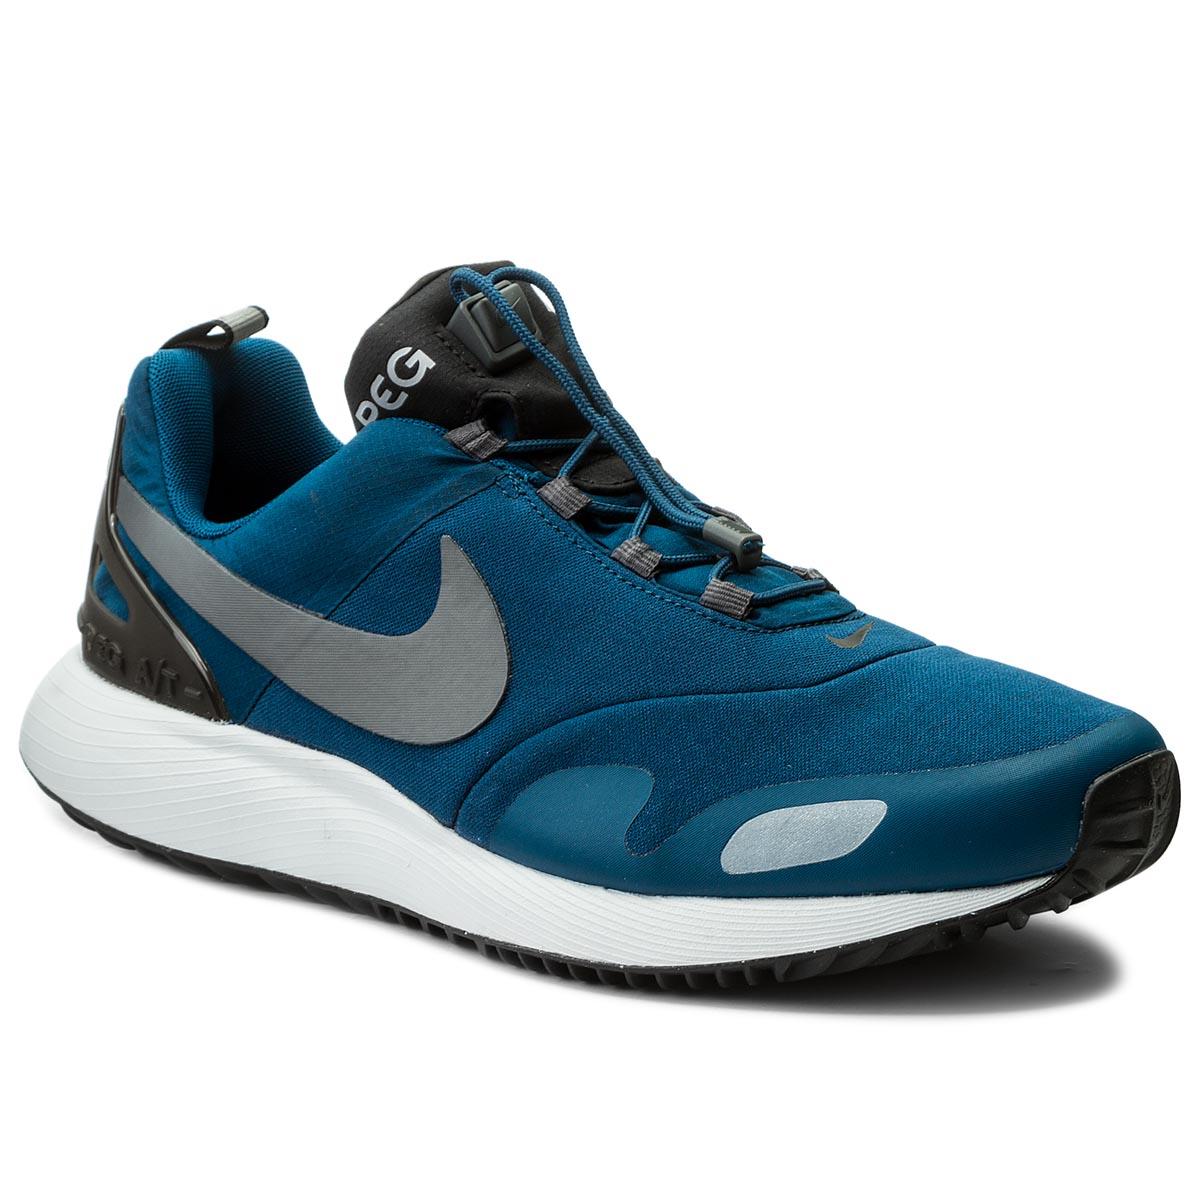 the latest 1f67e 8a2a6 Shoes NIKE Air Pegasus A/T 924469 402 Blue Force/Dark Grey/Black